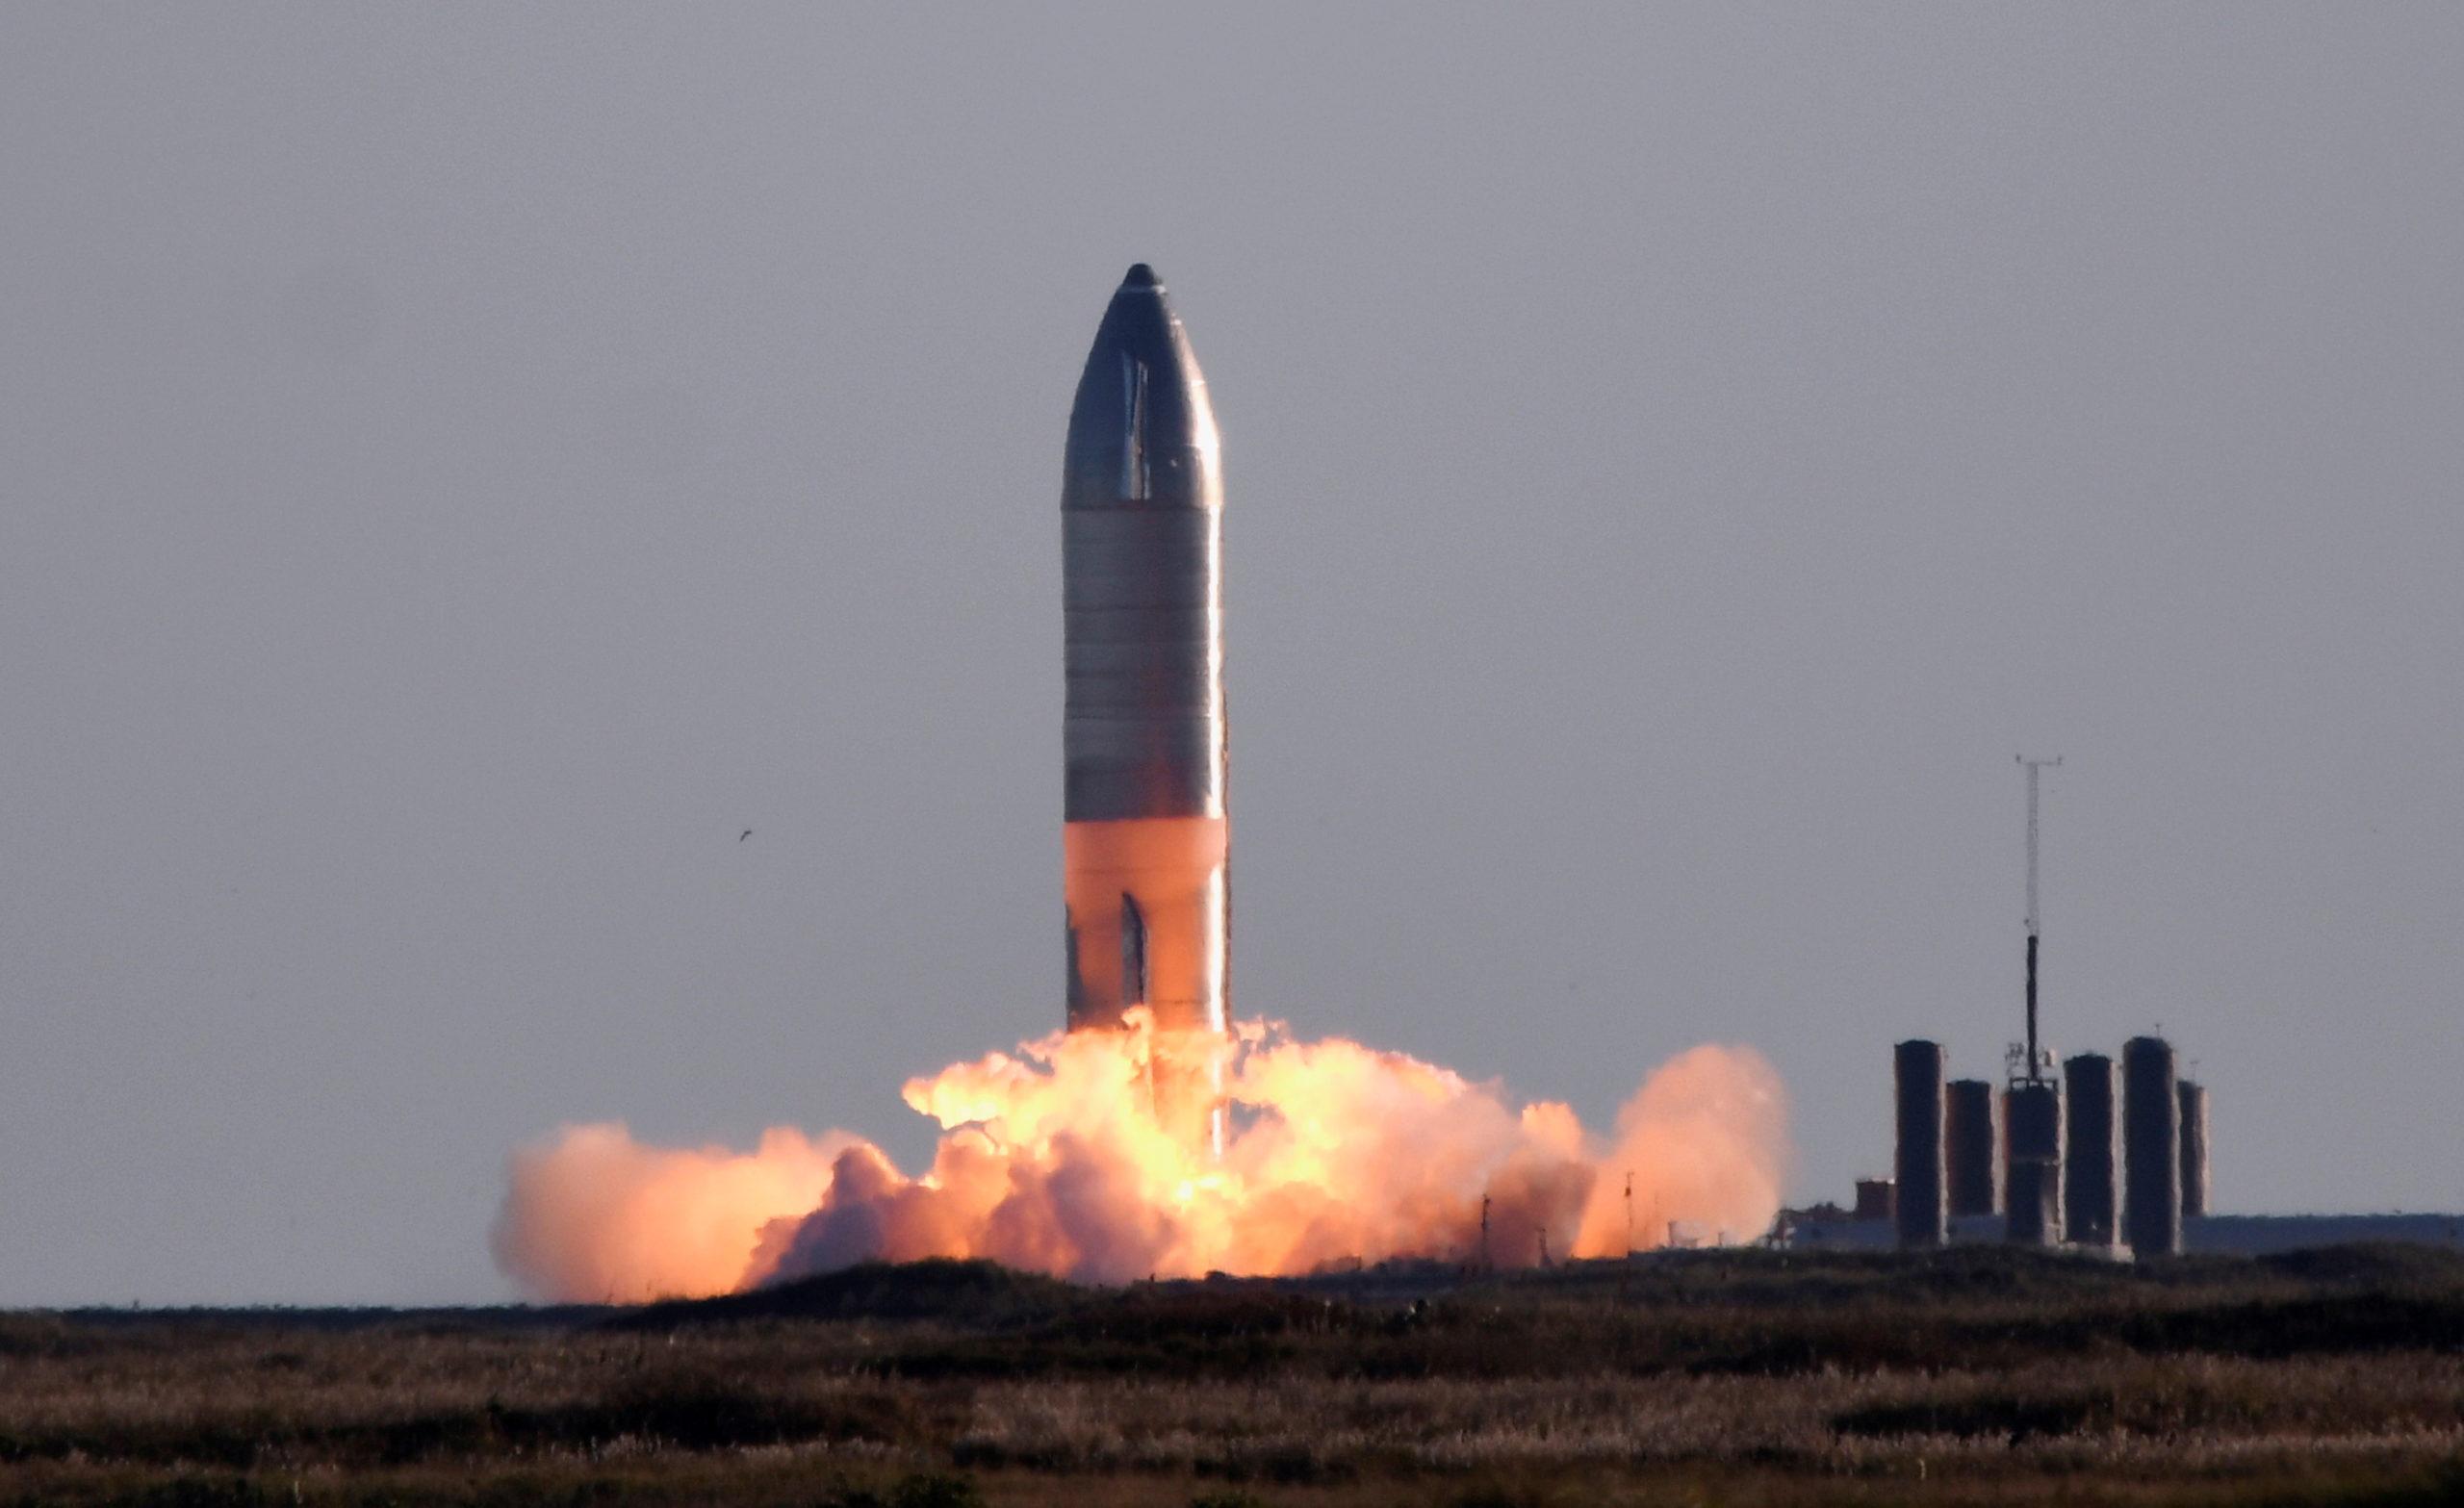 SN8, PROTOTIPO DE AERONAVE SPACEX EXPLOTA DURANTE ATERRIZAJE